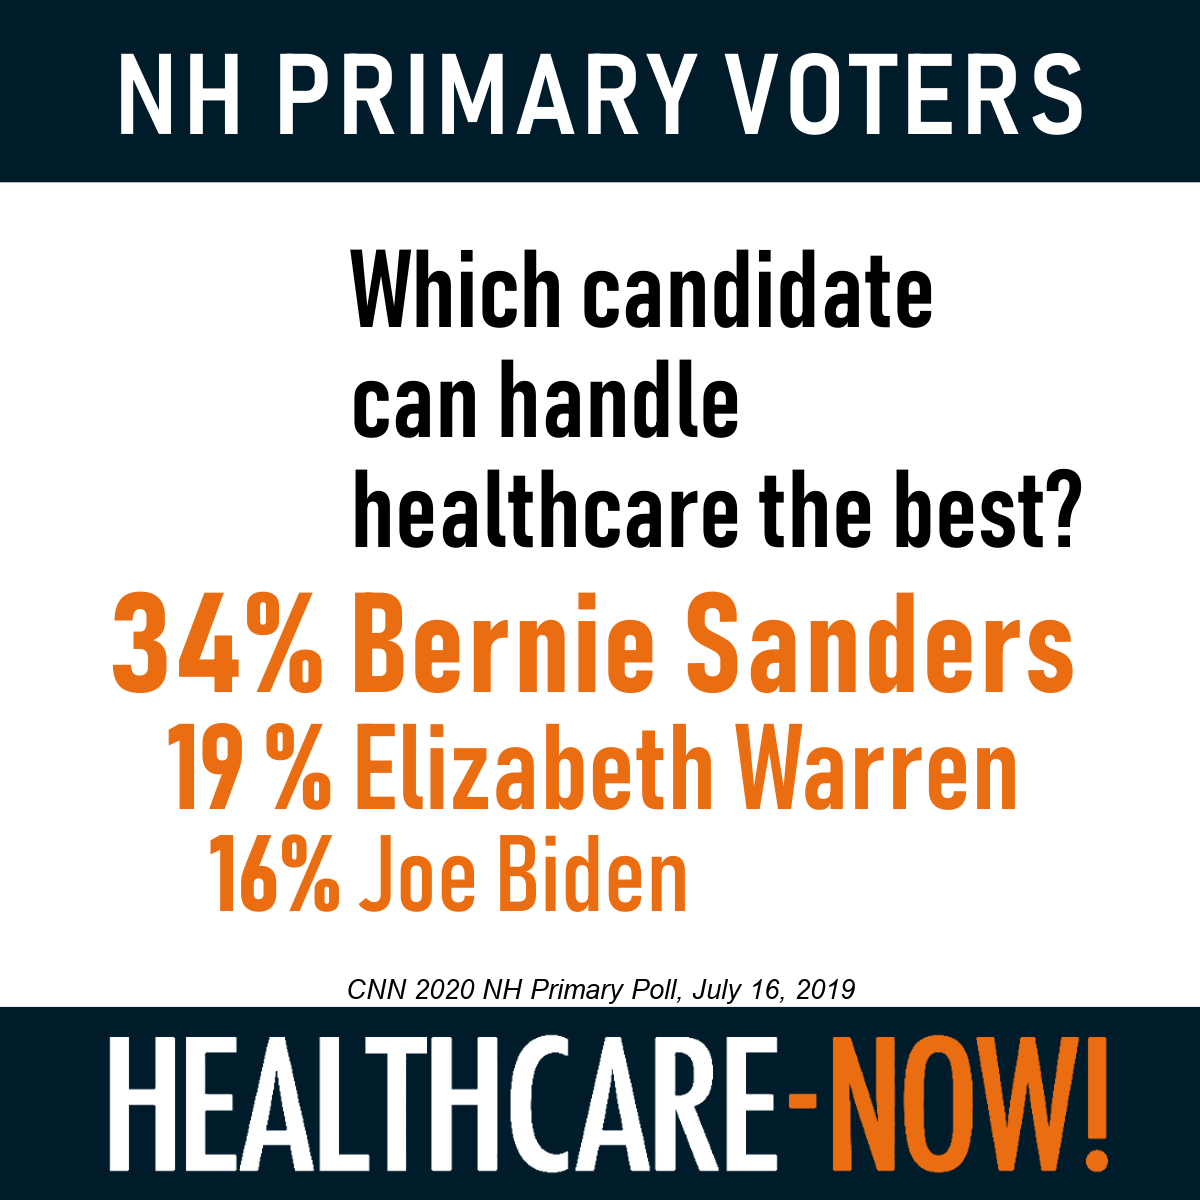 HCN CNN NH Primary Voters Meme